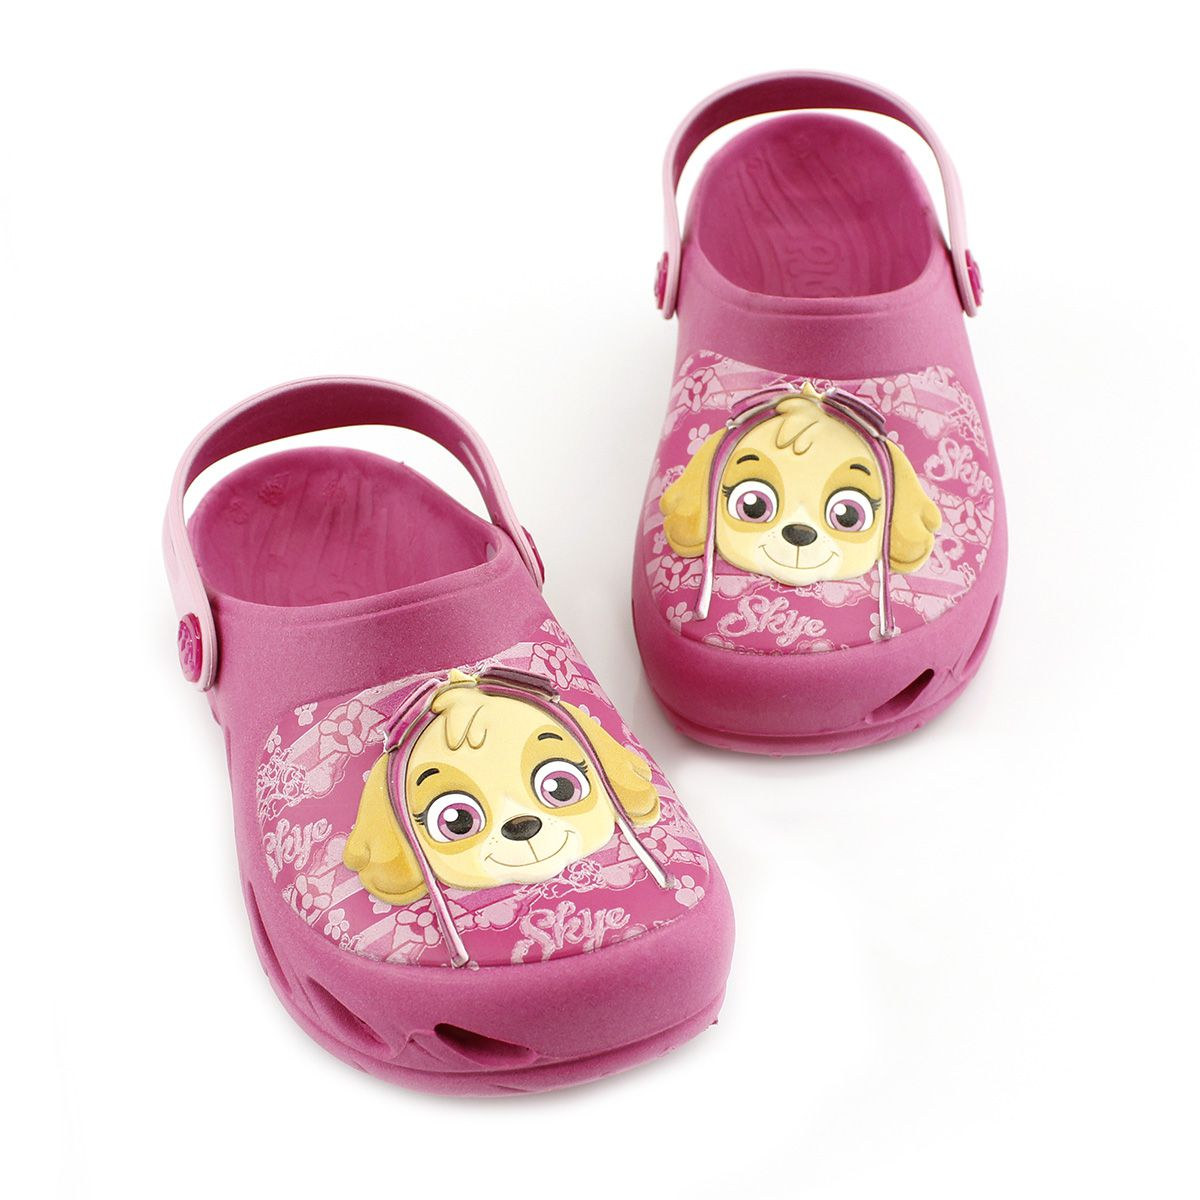 Babuche Plugt Ventor Kids Patrulha Canina Skye Pink